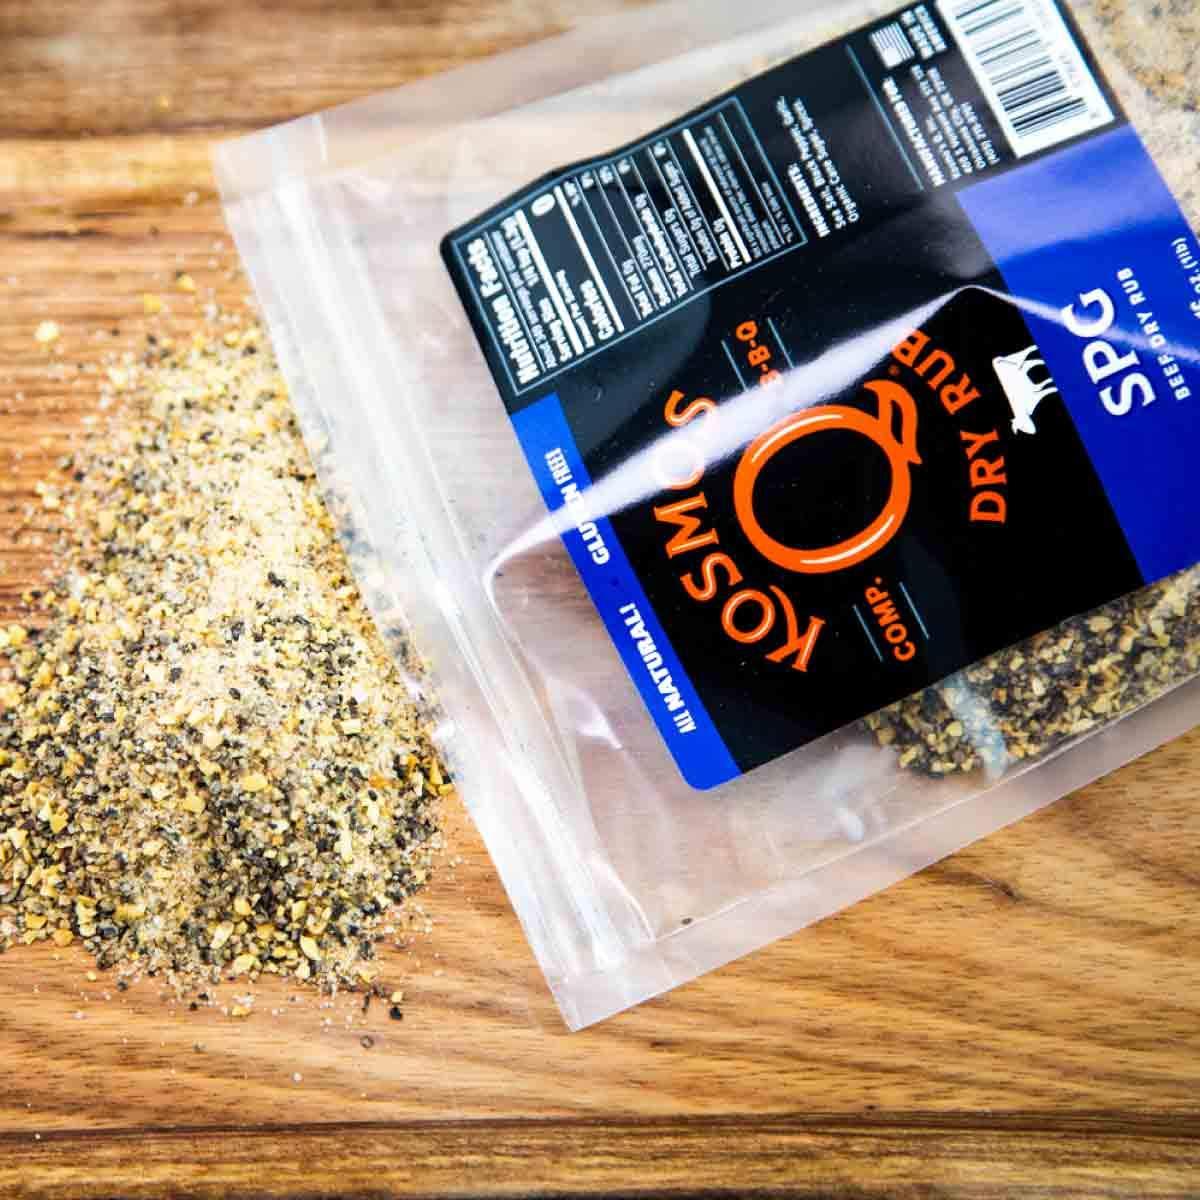 Kosmos Q - Alfombra para barbacoa: Amazon.com: Grocery ...